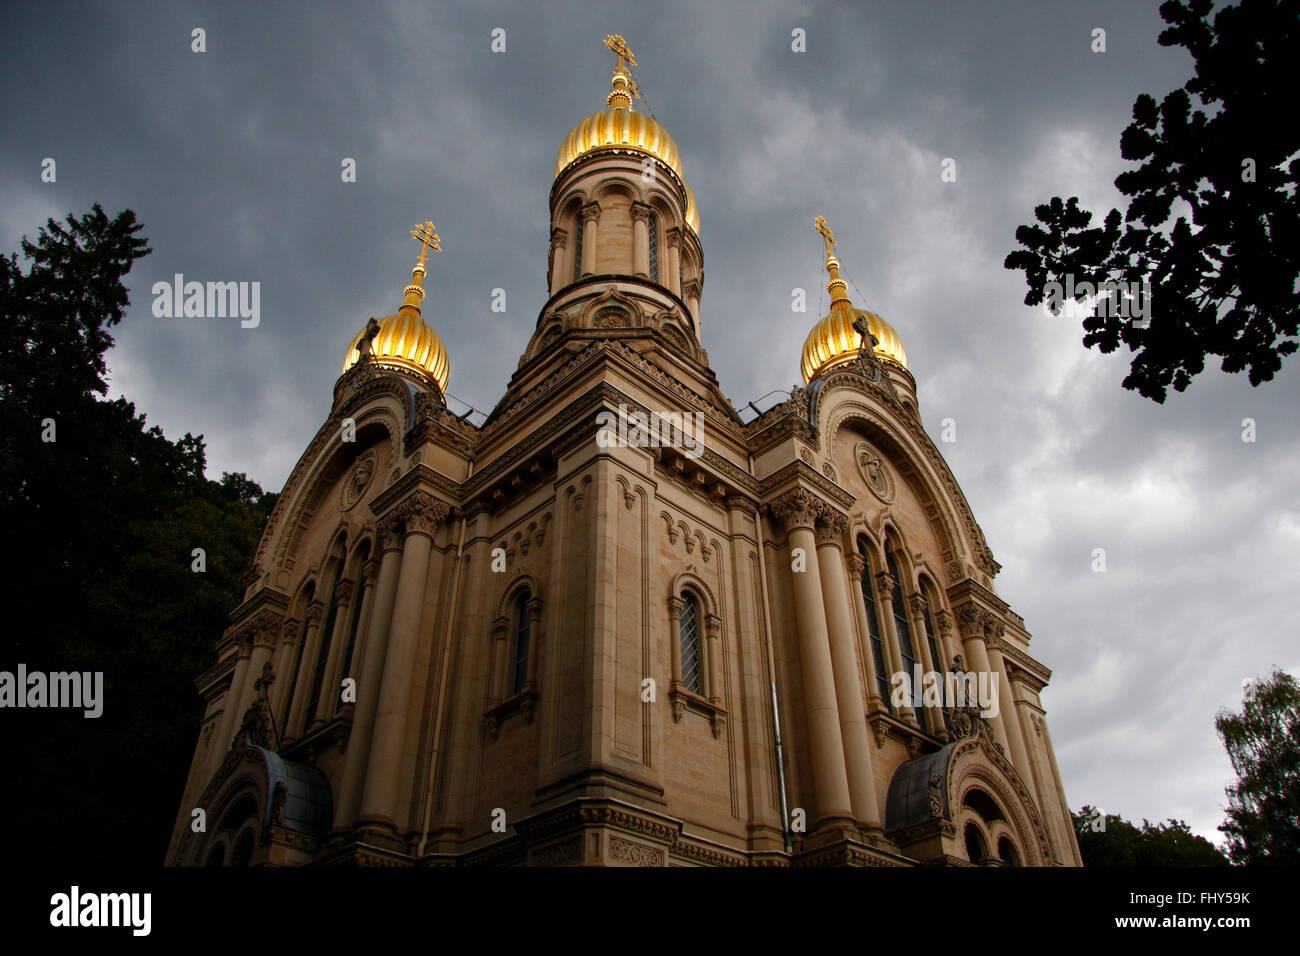 russisch-orthodoxe Kirche, Neroberg, Wiesbaden. - Stock Image